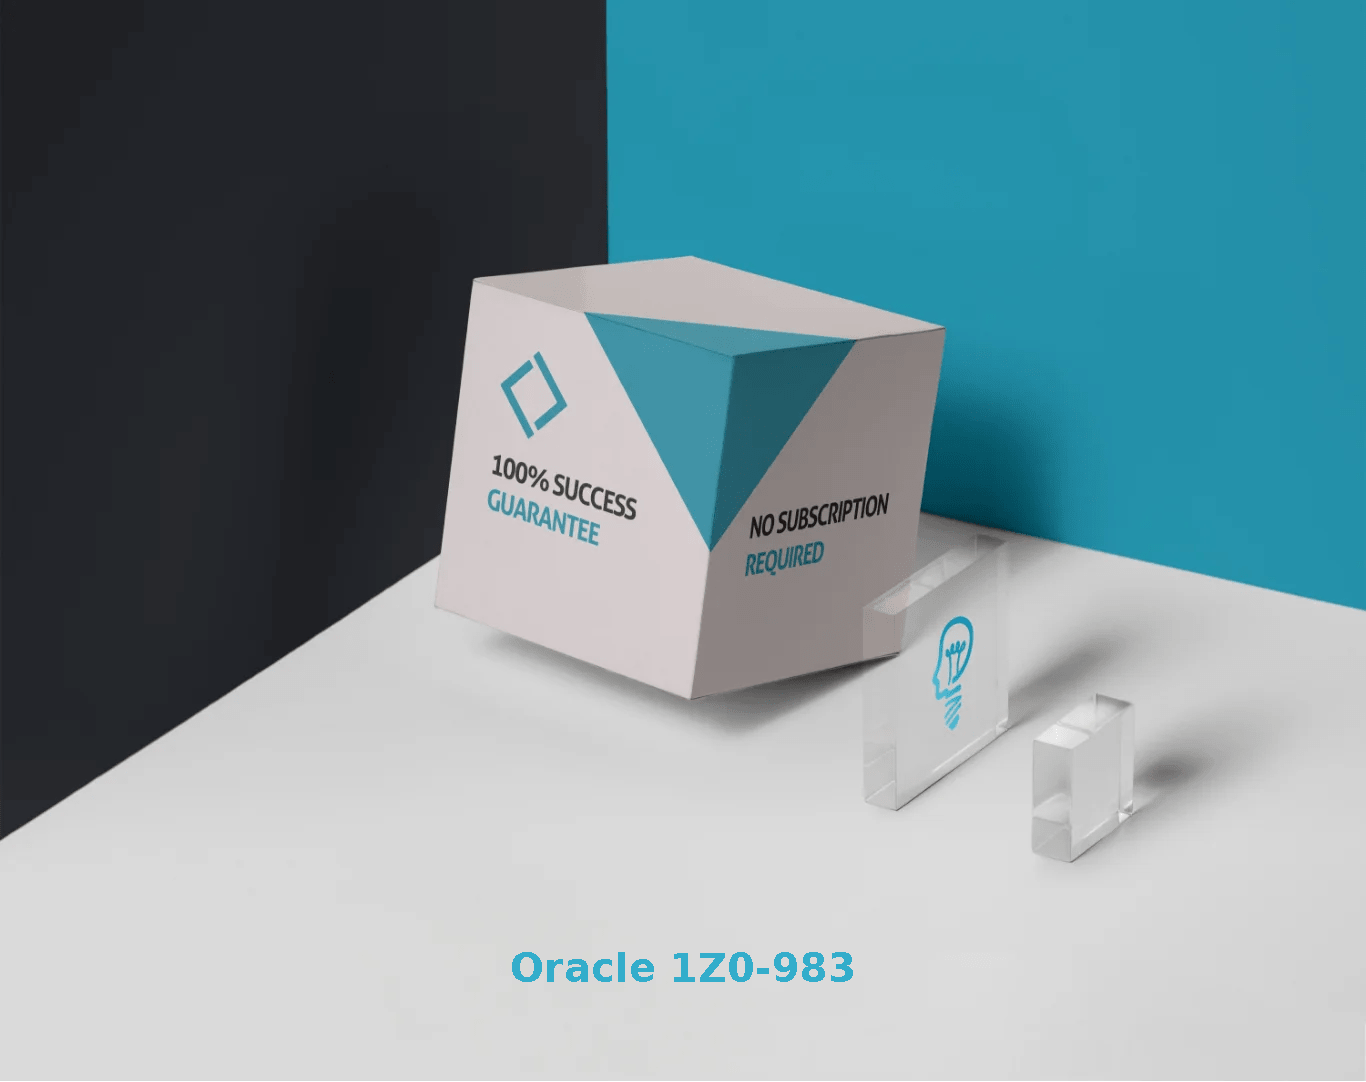 Oracle 1Z0-983 Exams